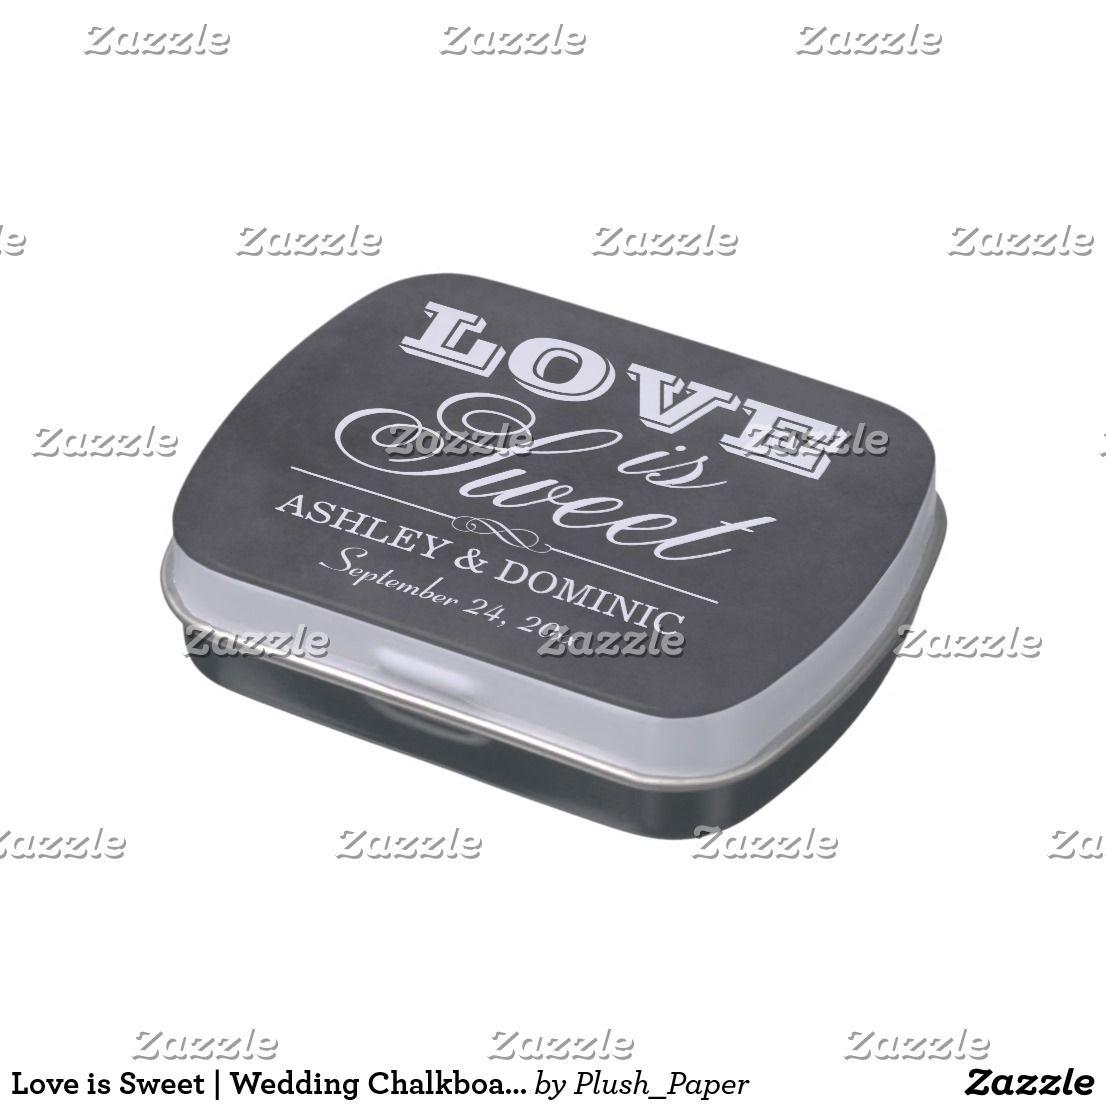 Love is Sweet | Wedding Chalkboard Candy Tins Wedding candy favor ...